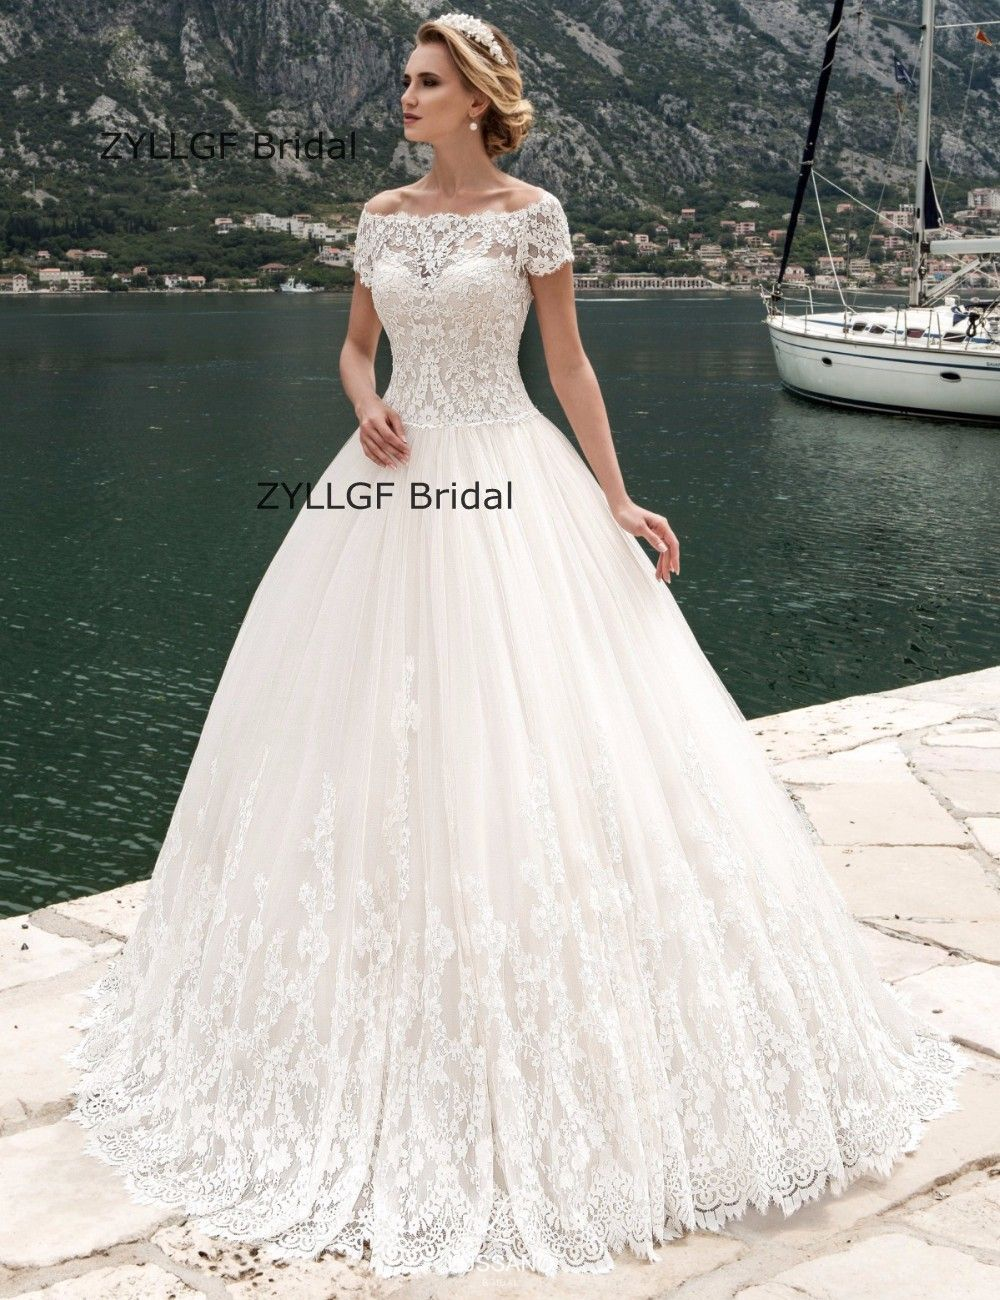 Cheap Vestido De Noiva Buy Quality Vestido De Noiva Plus Directly From China De Noiva Suppliers Wedding Dresses Custom Wedding Dress Ball Gown Wedding Dress [ 1300 x 1000 Pixel ]